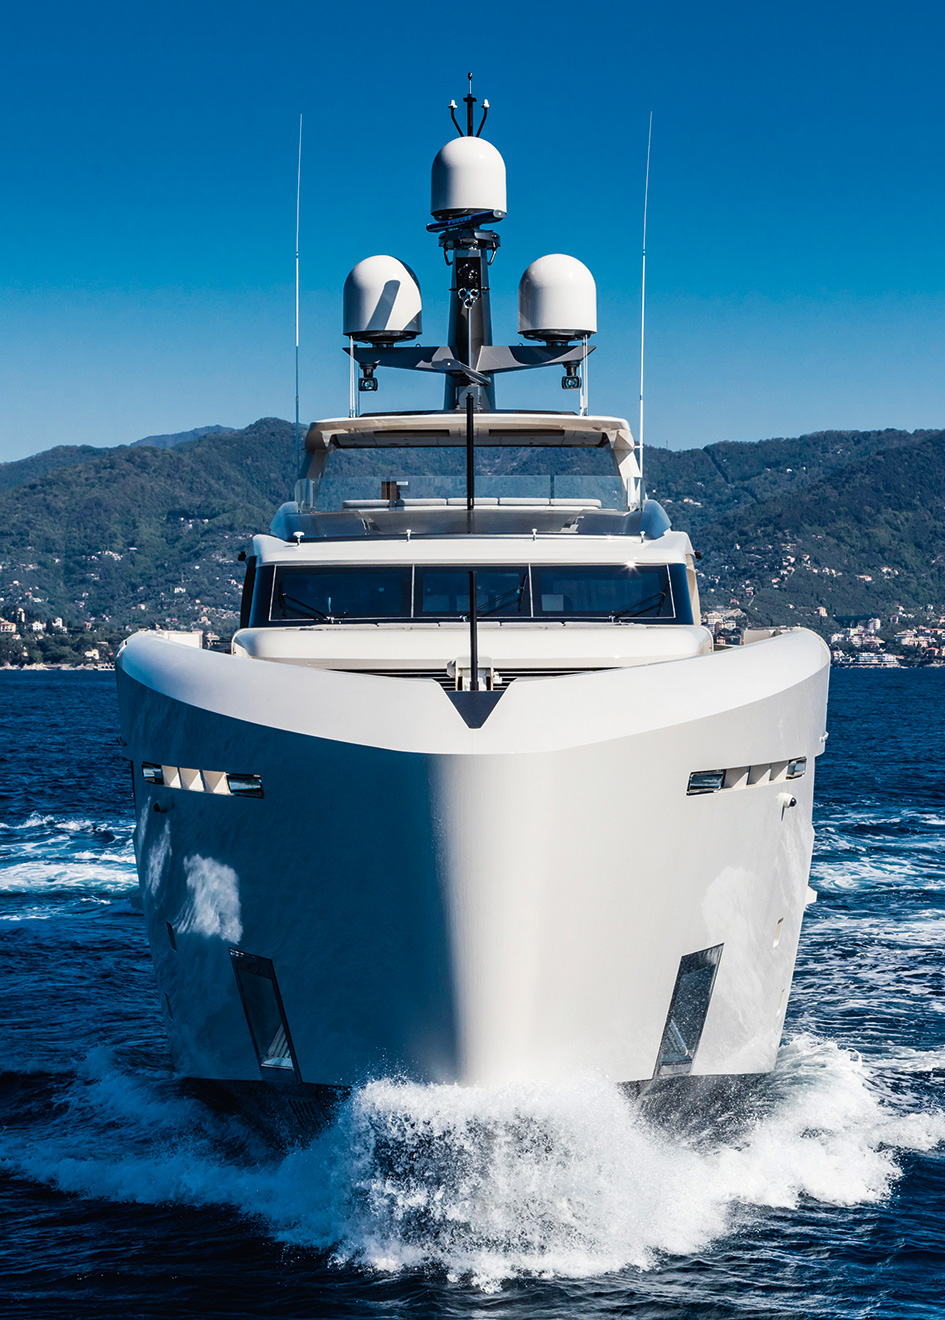 bow-running-shot-of-the-tankoa-motor-yacht-vertige-credit-alberto-cocchi